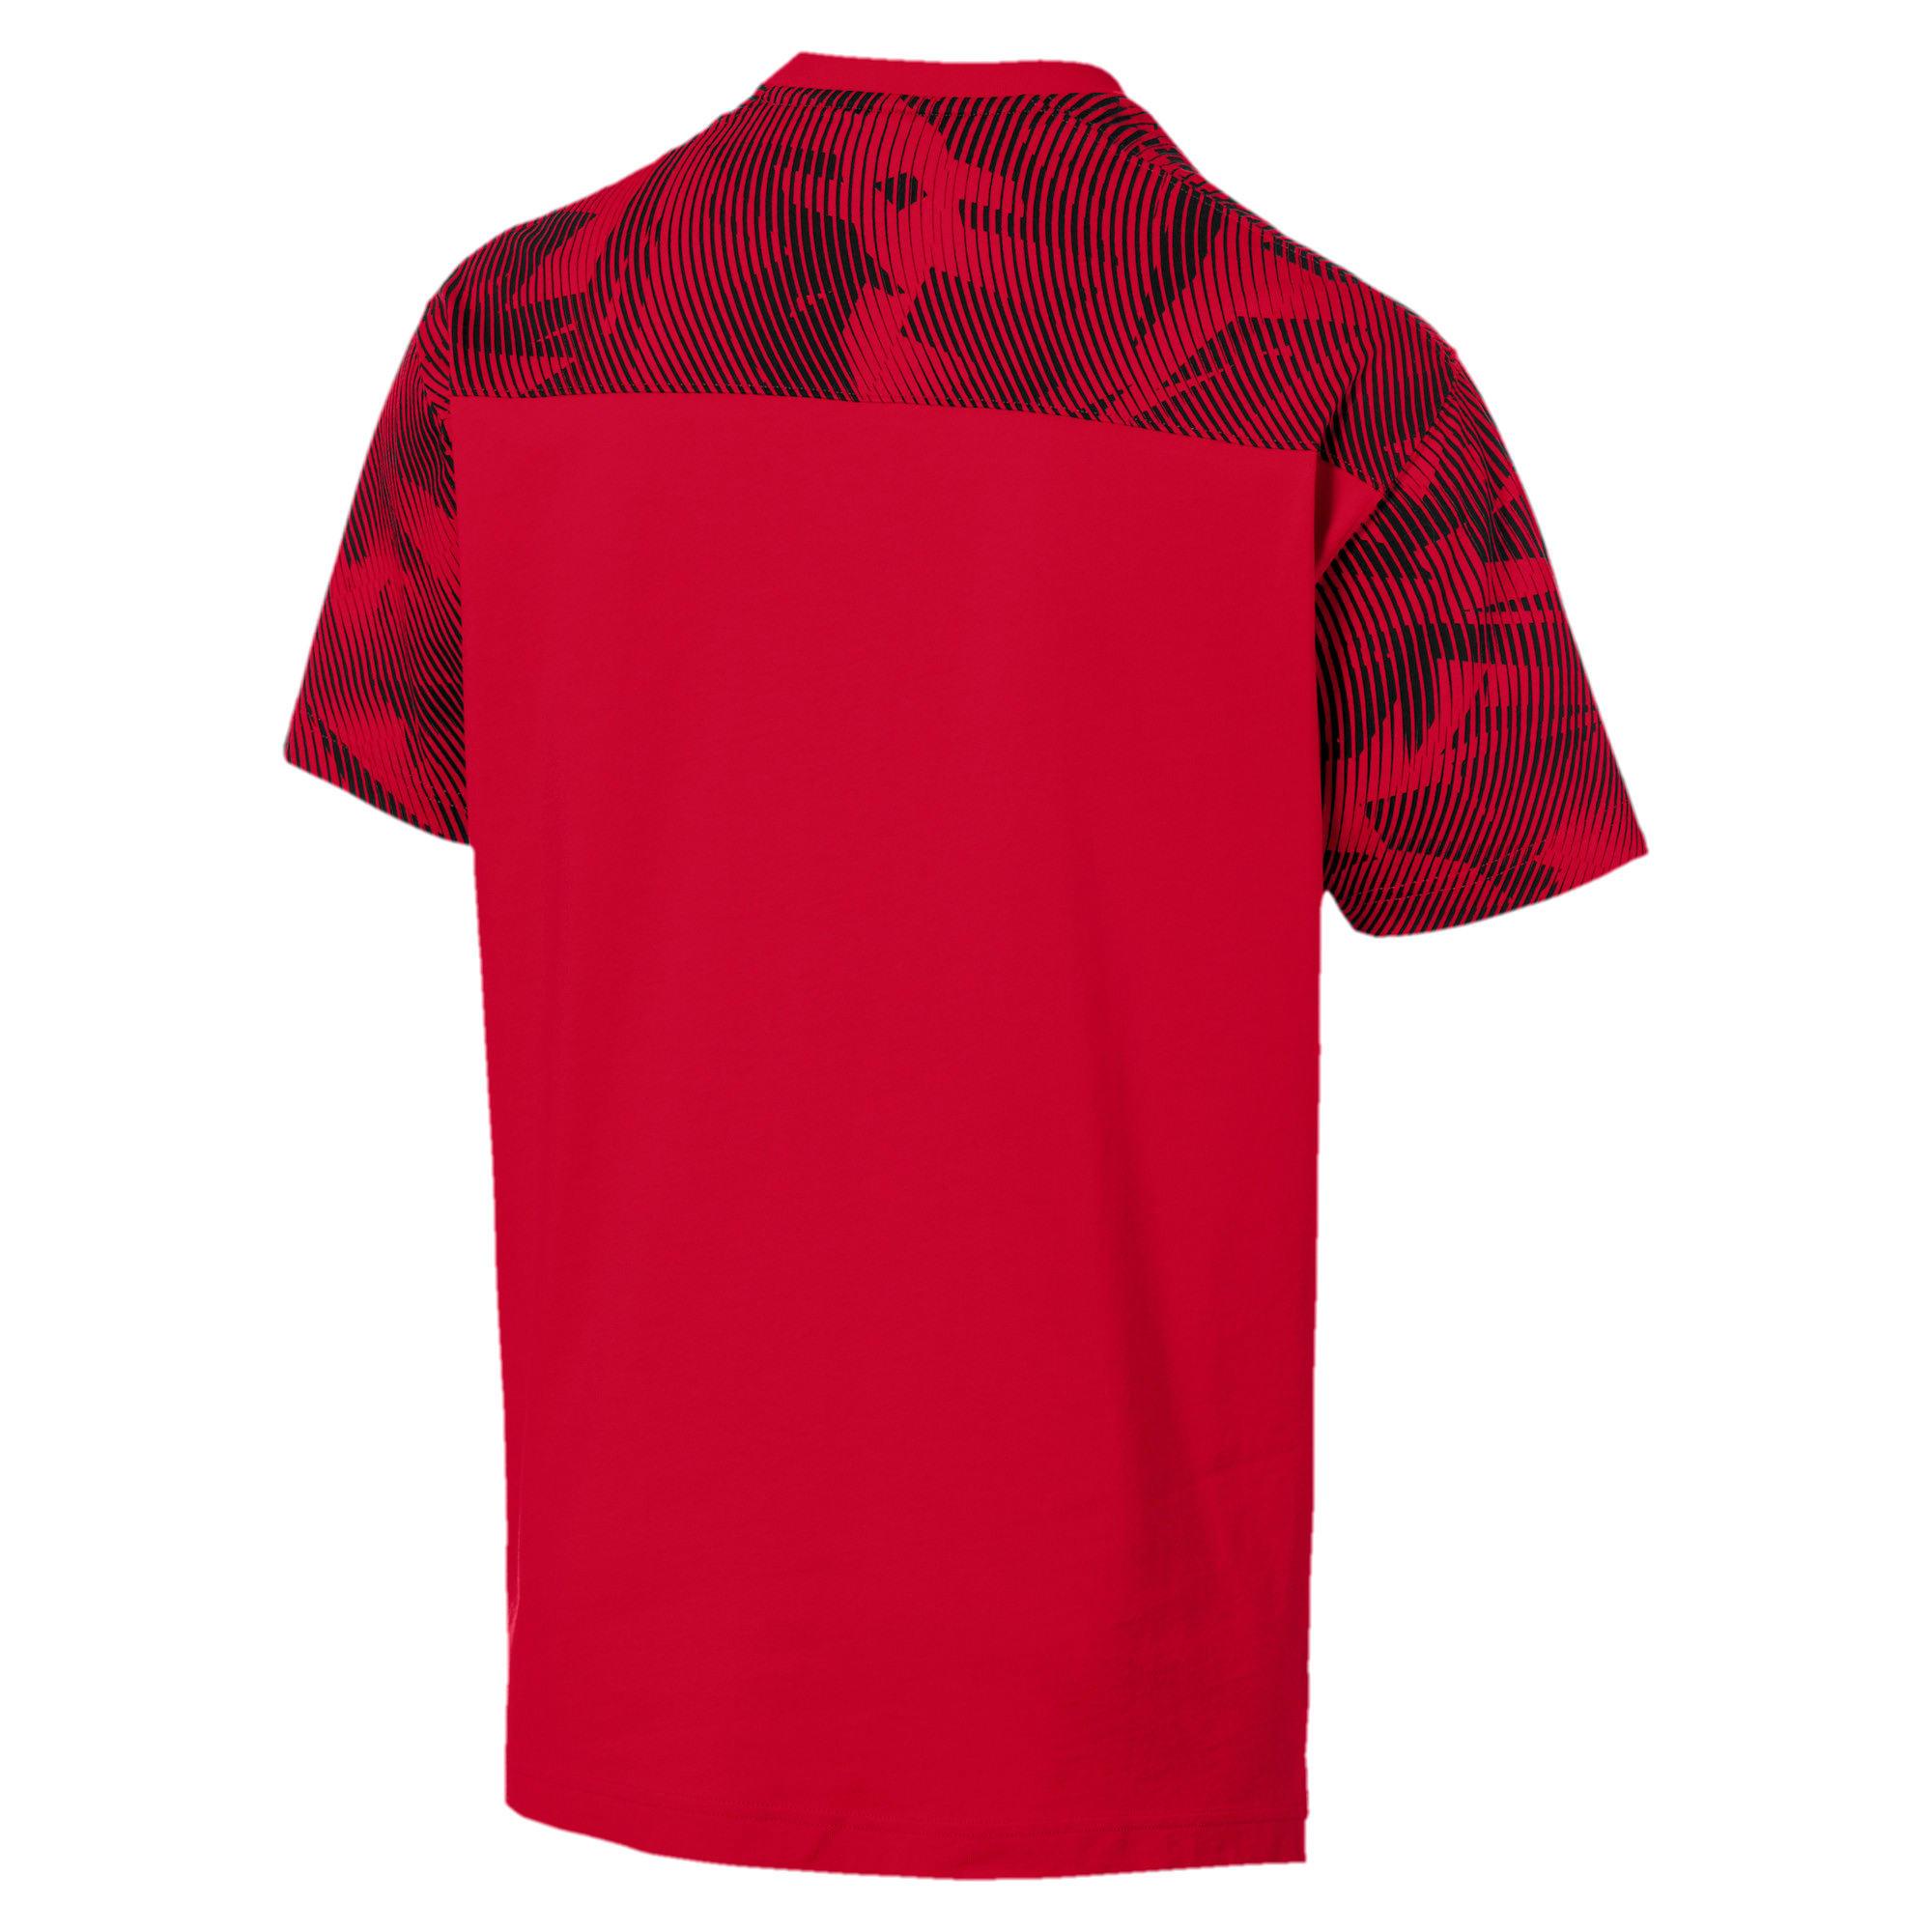 Thumbnail 5 of AC Milan Casuals Men's Tee, Tango Red -Puma Black, medium